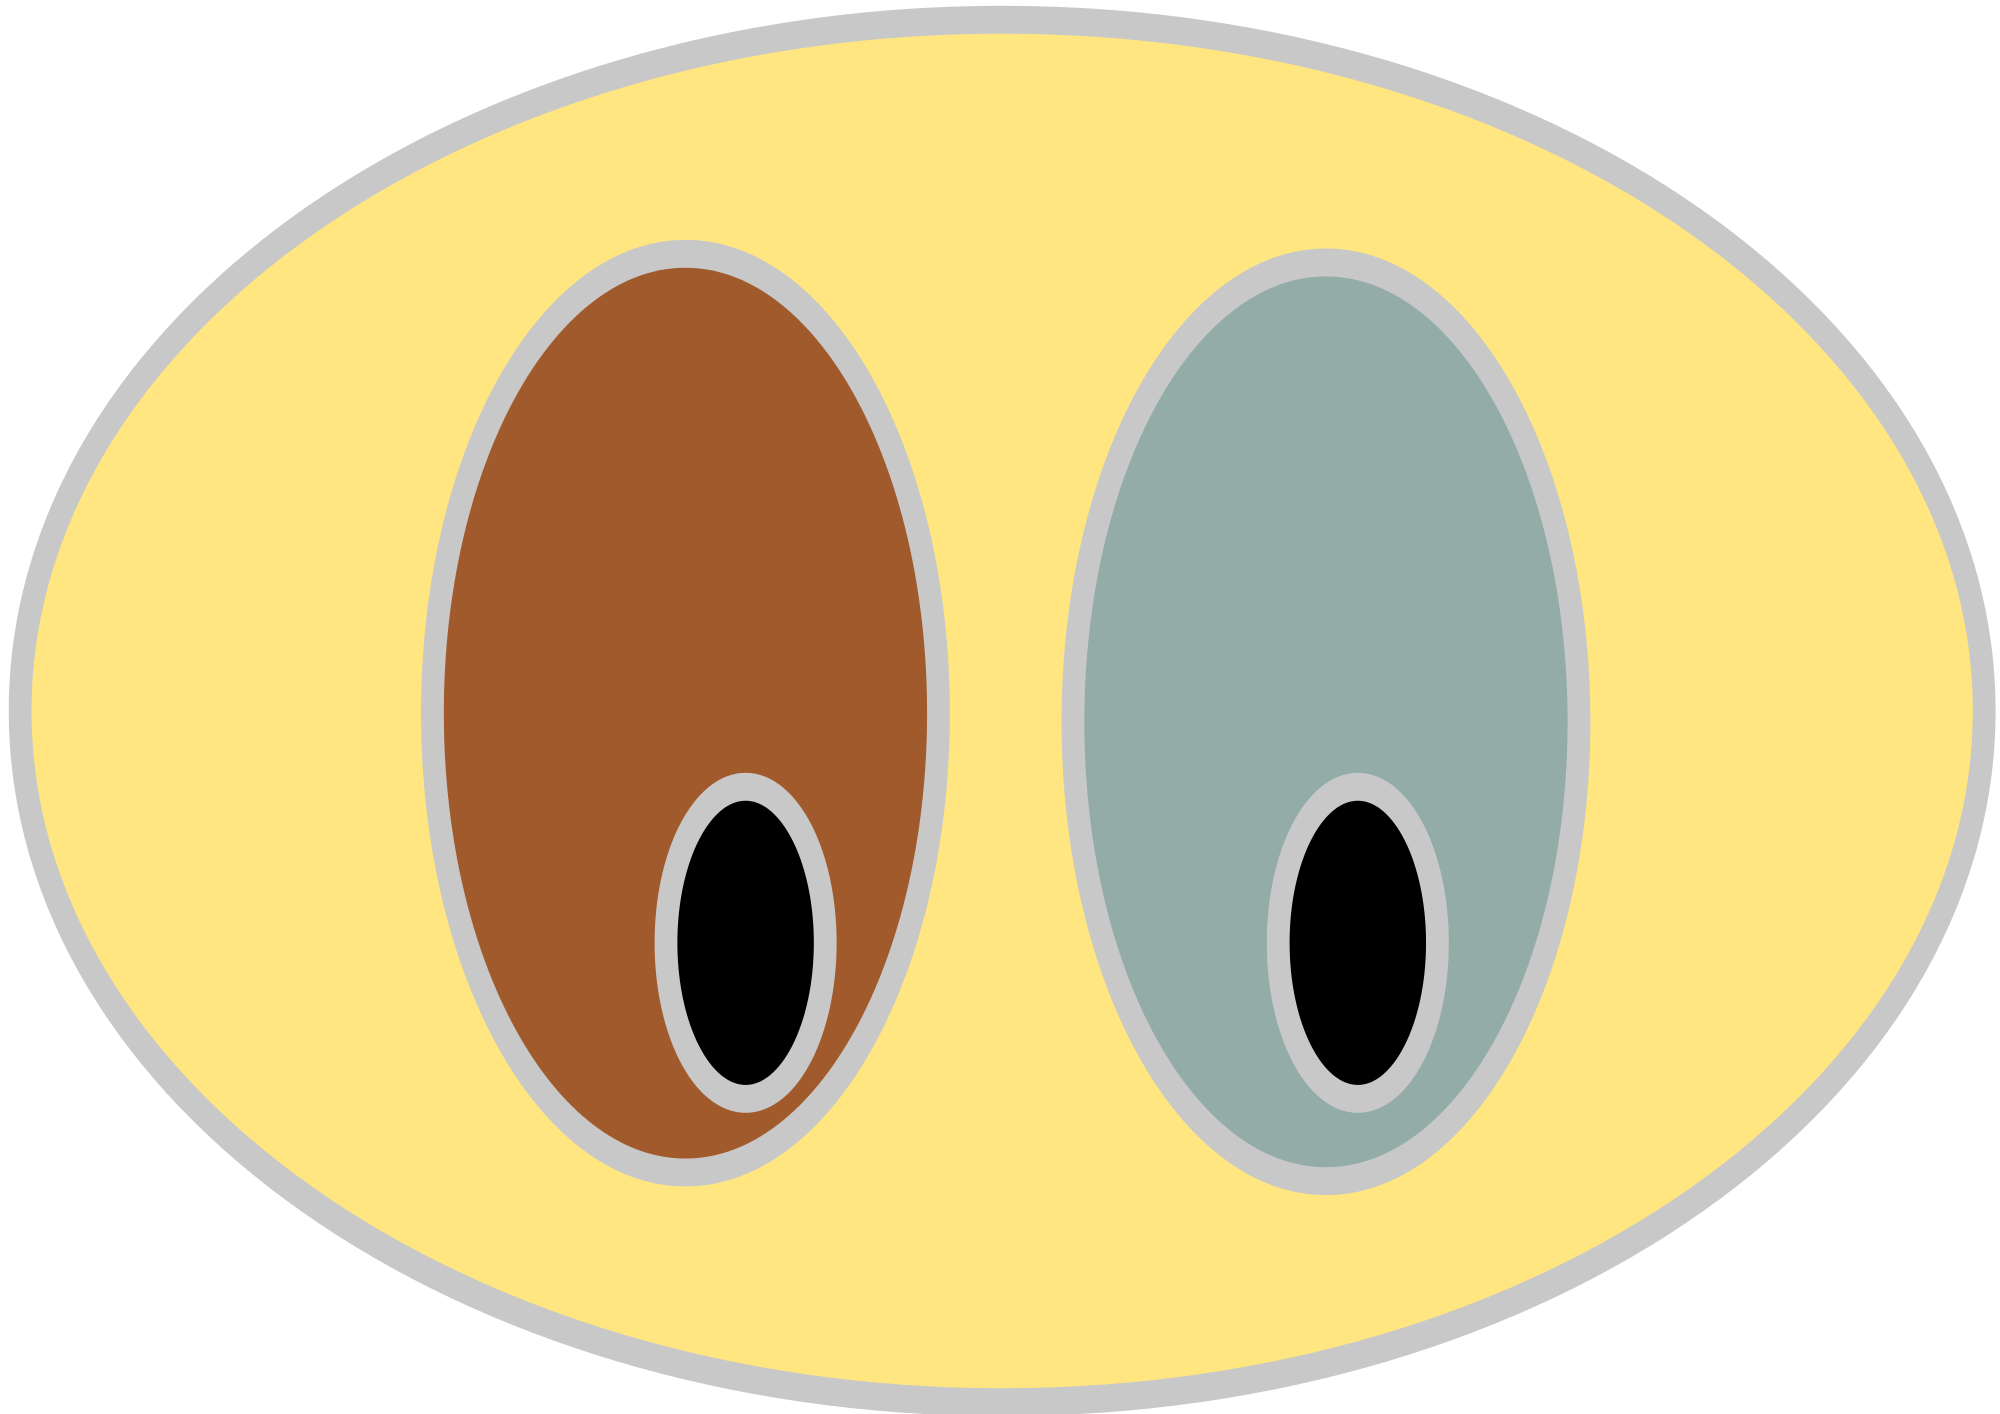 Clipart svg graphic File:Heterochromia iridium clipart.svg - Wikimedia Commons graphic